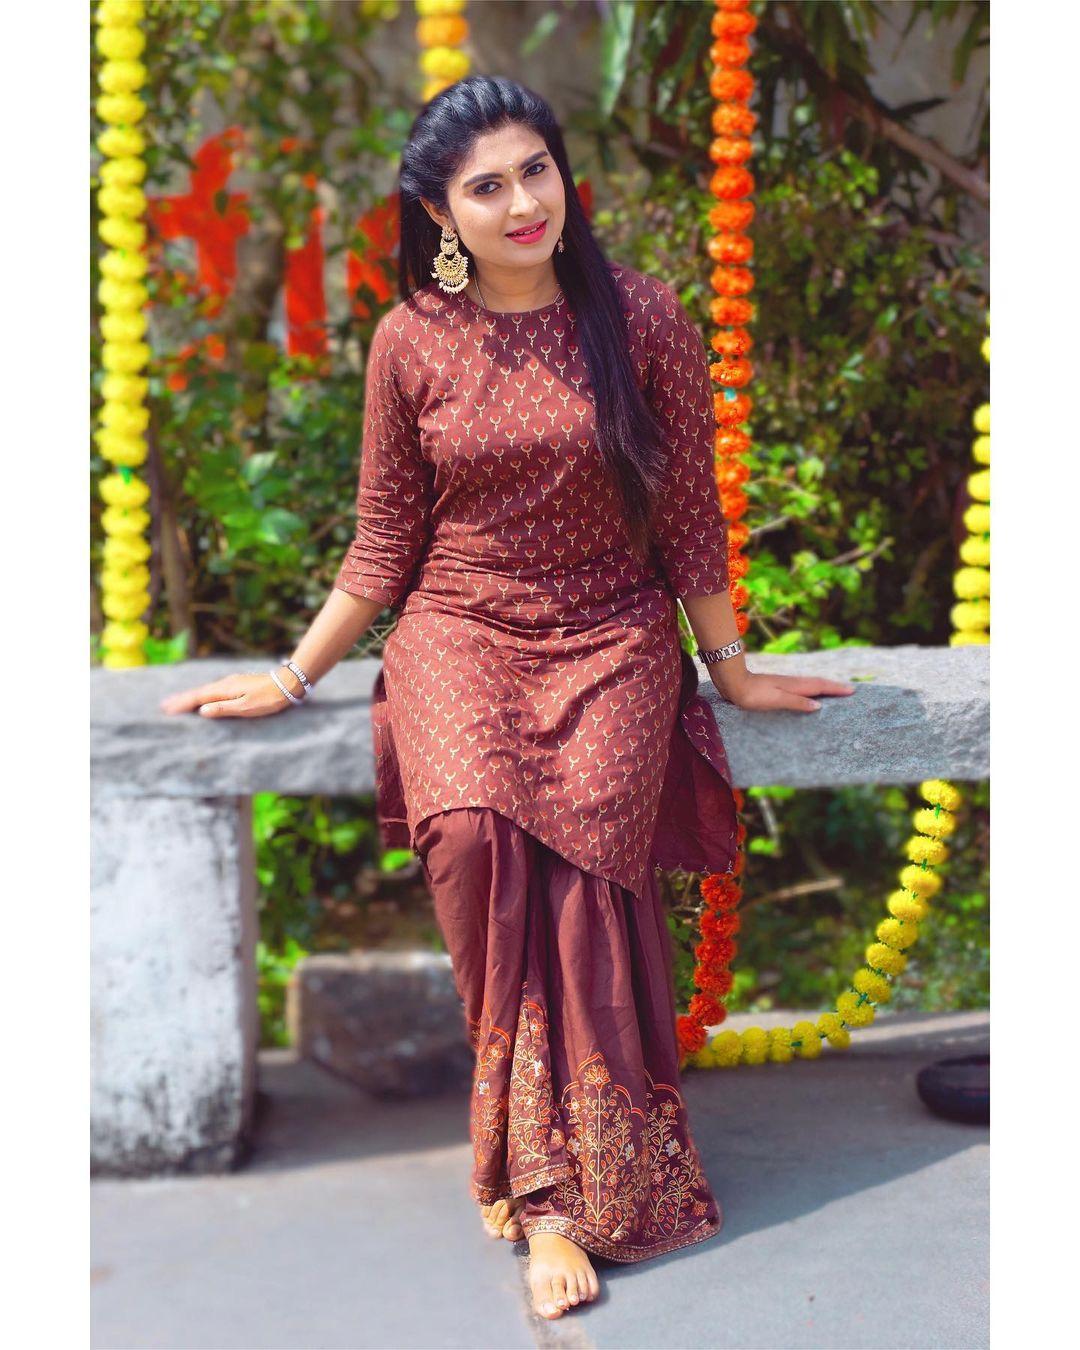 Akshitha Bopaiah Images